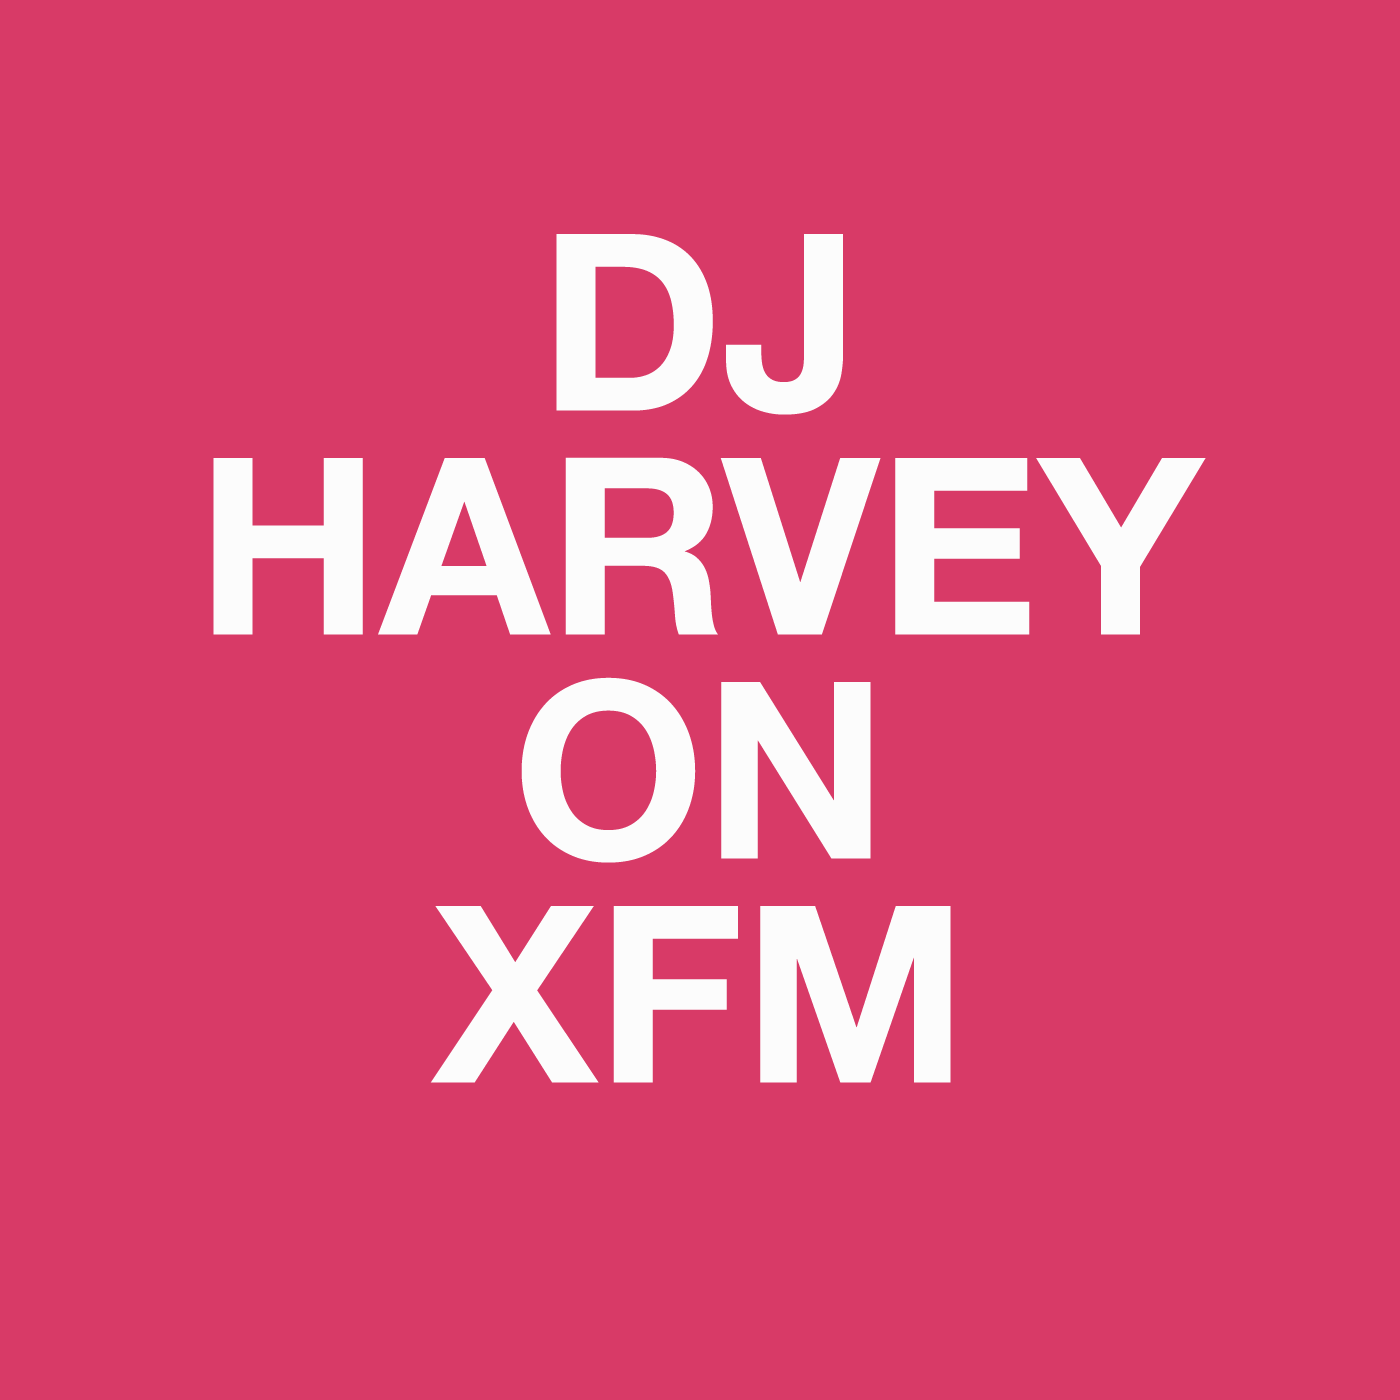 Dj Harvey, XFM, Nuphonic, Radio, Disco, Show